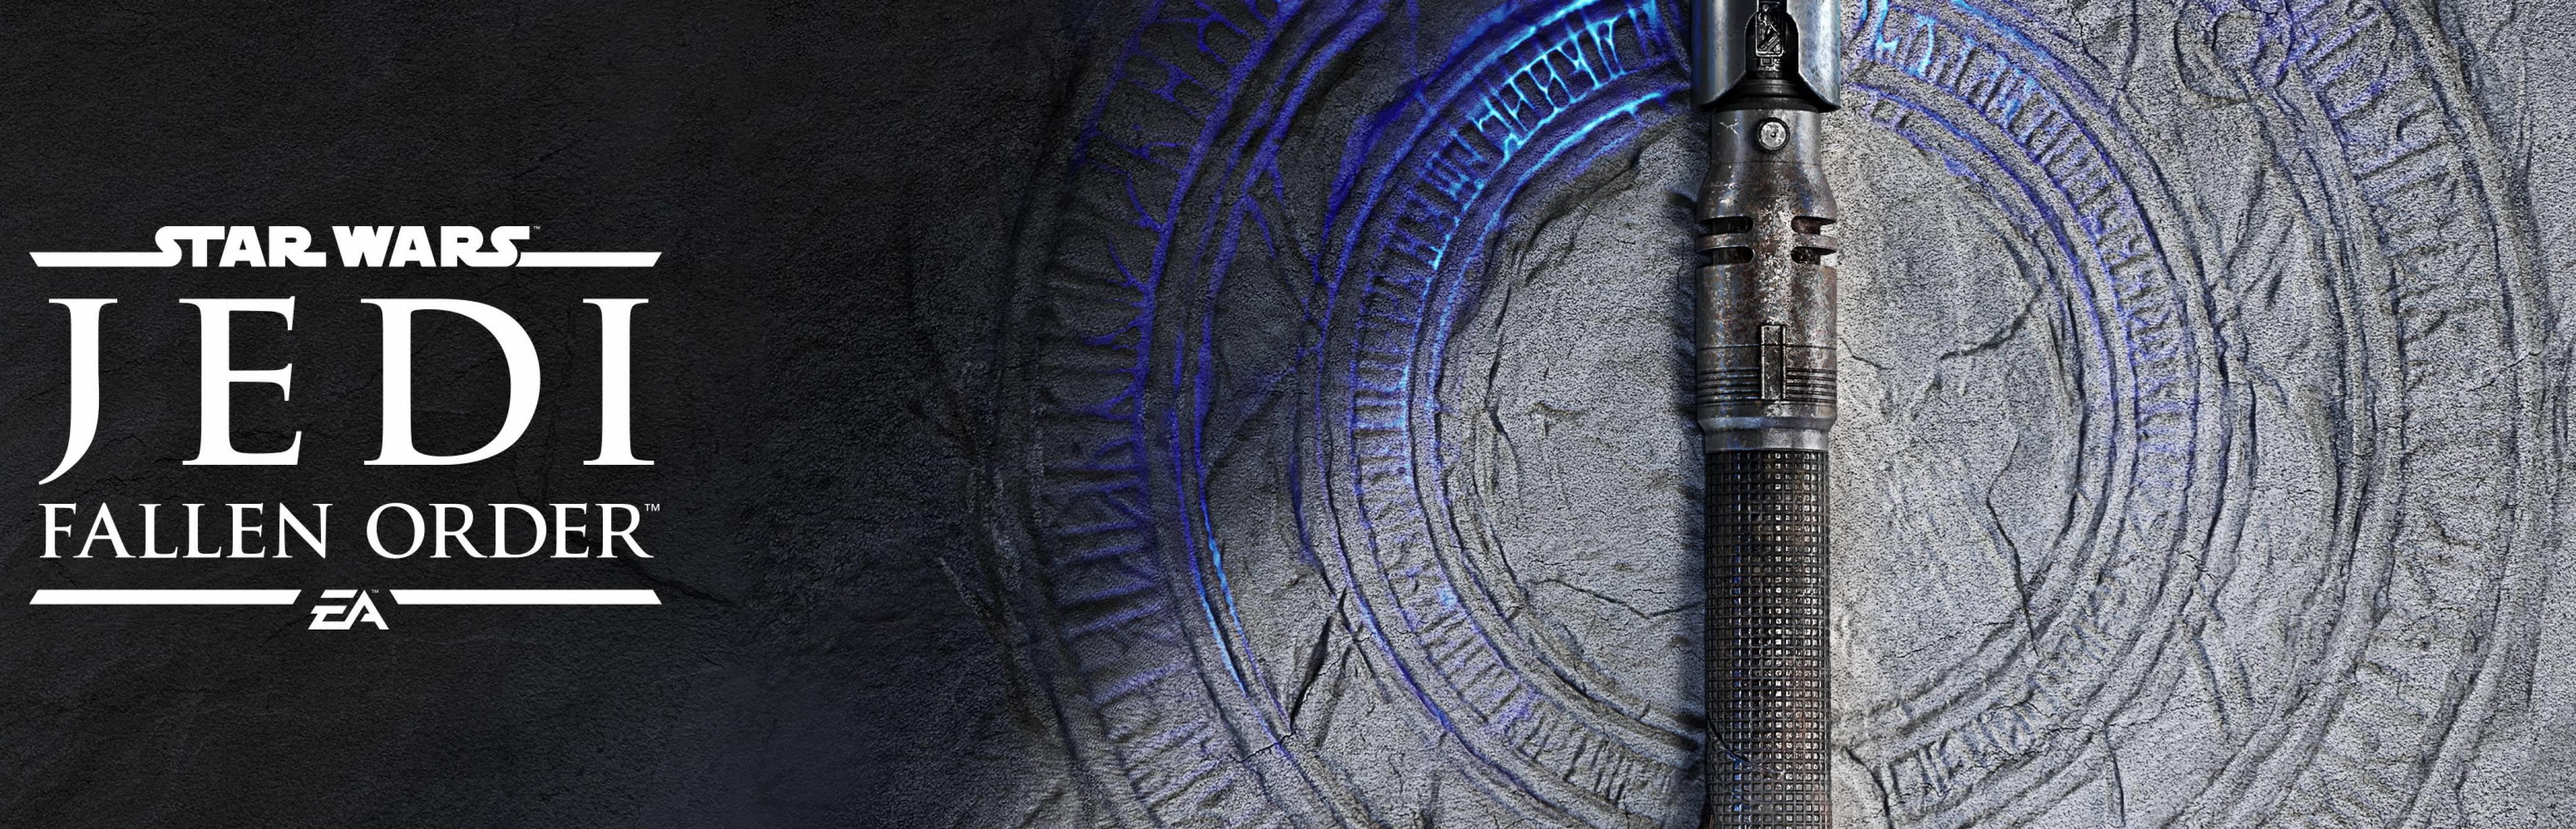 Star Wars Jedi: Fallen Order – как една игра за седем обра деветките?